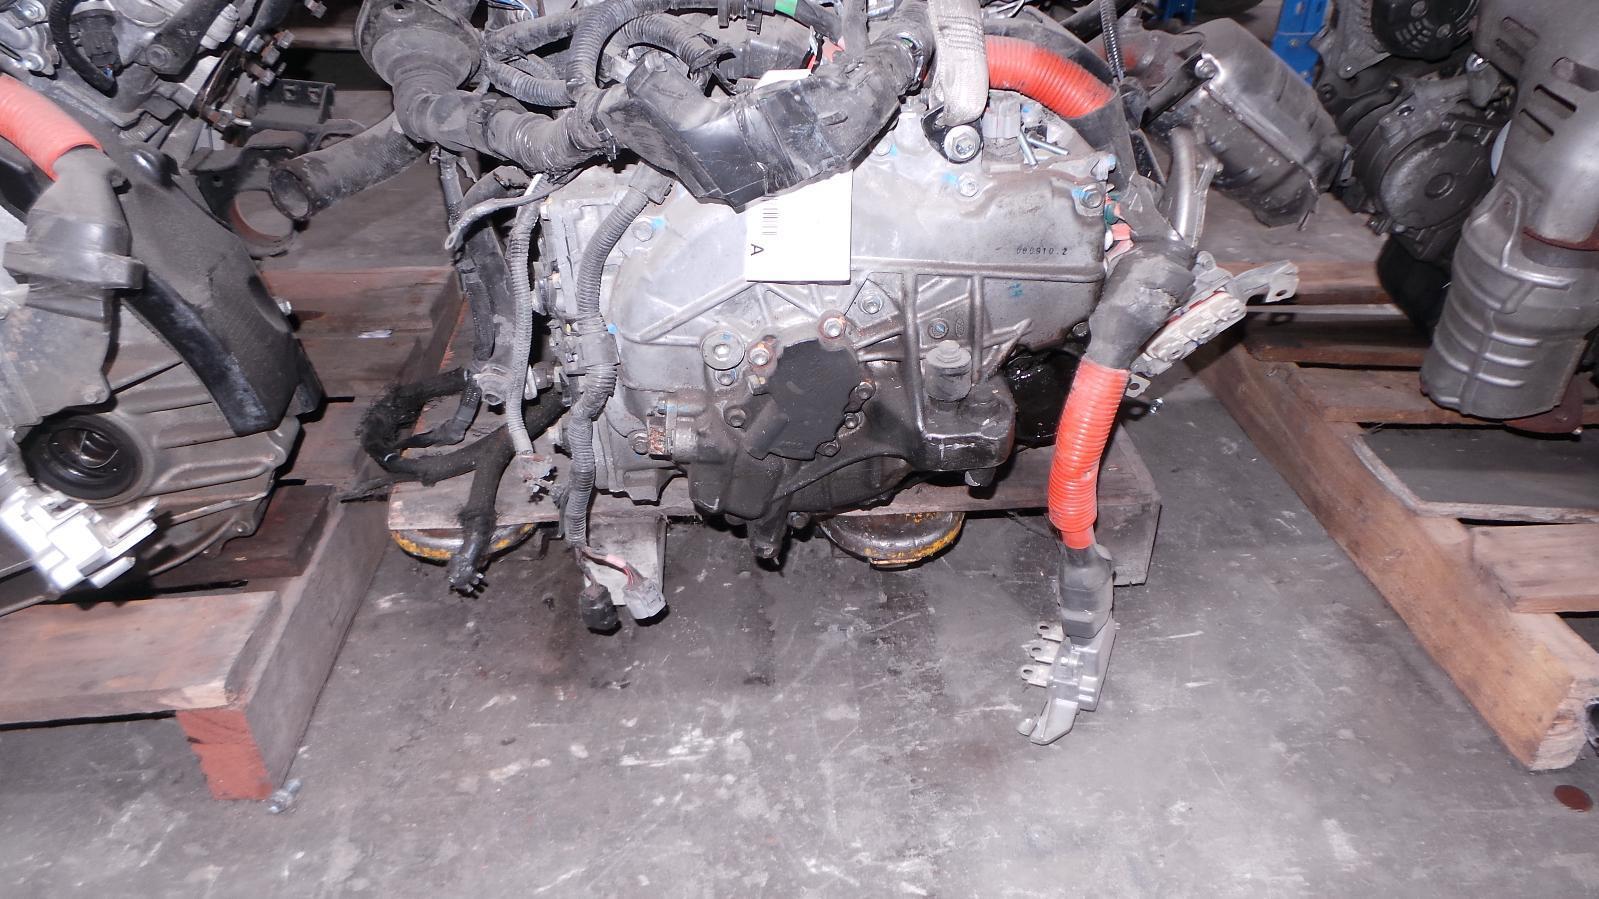 LEXUS RX SERIES, Trans/Gearbox, AUTO, PETROL, 3.3, 3MZ, MHU3#, RX400H, 09/06-02/09